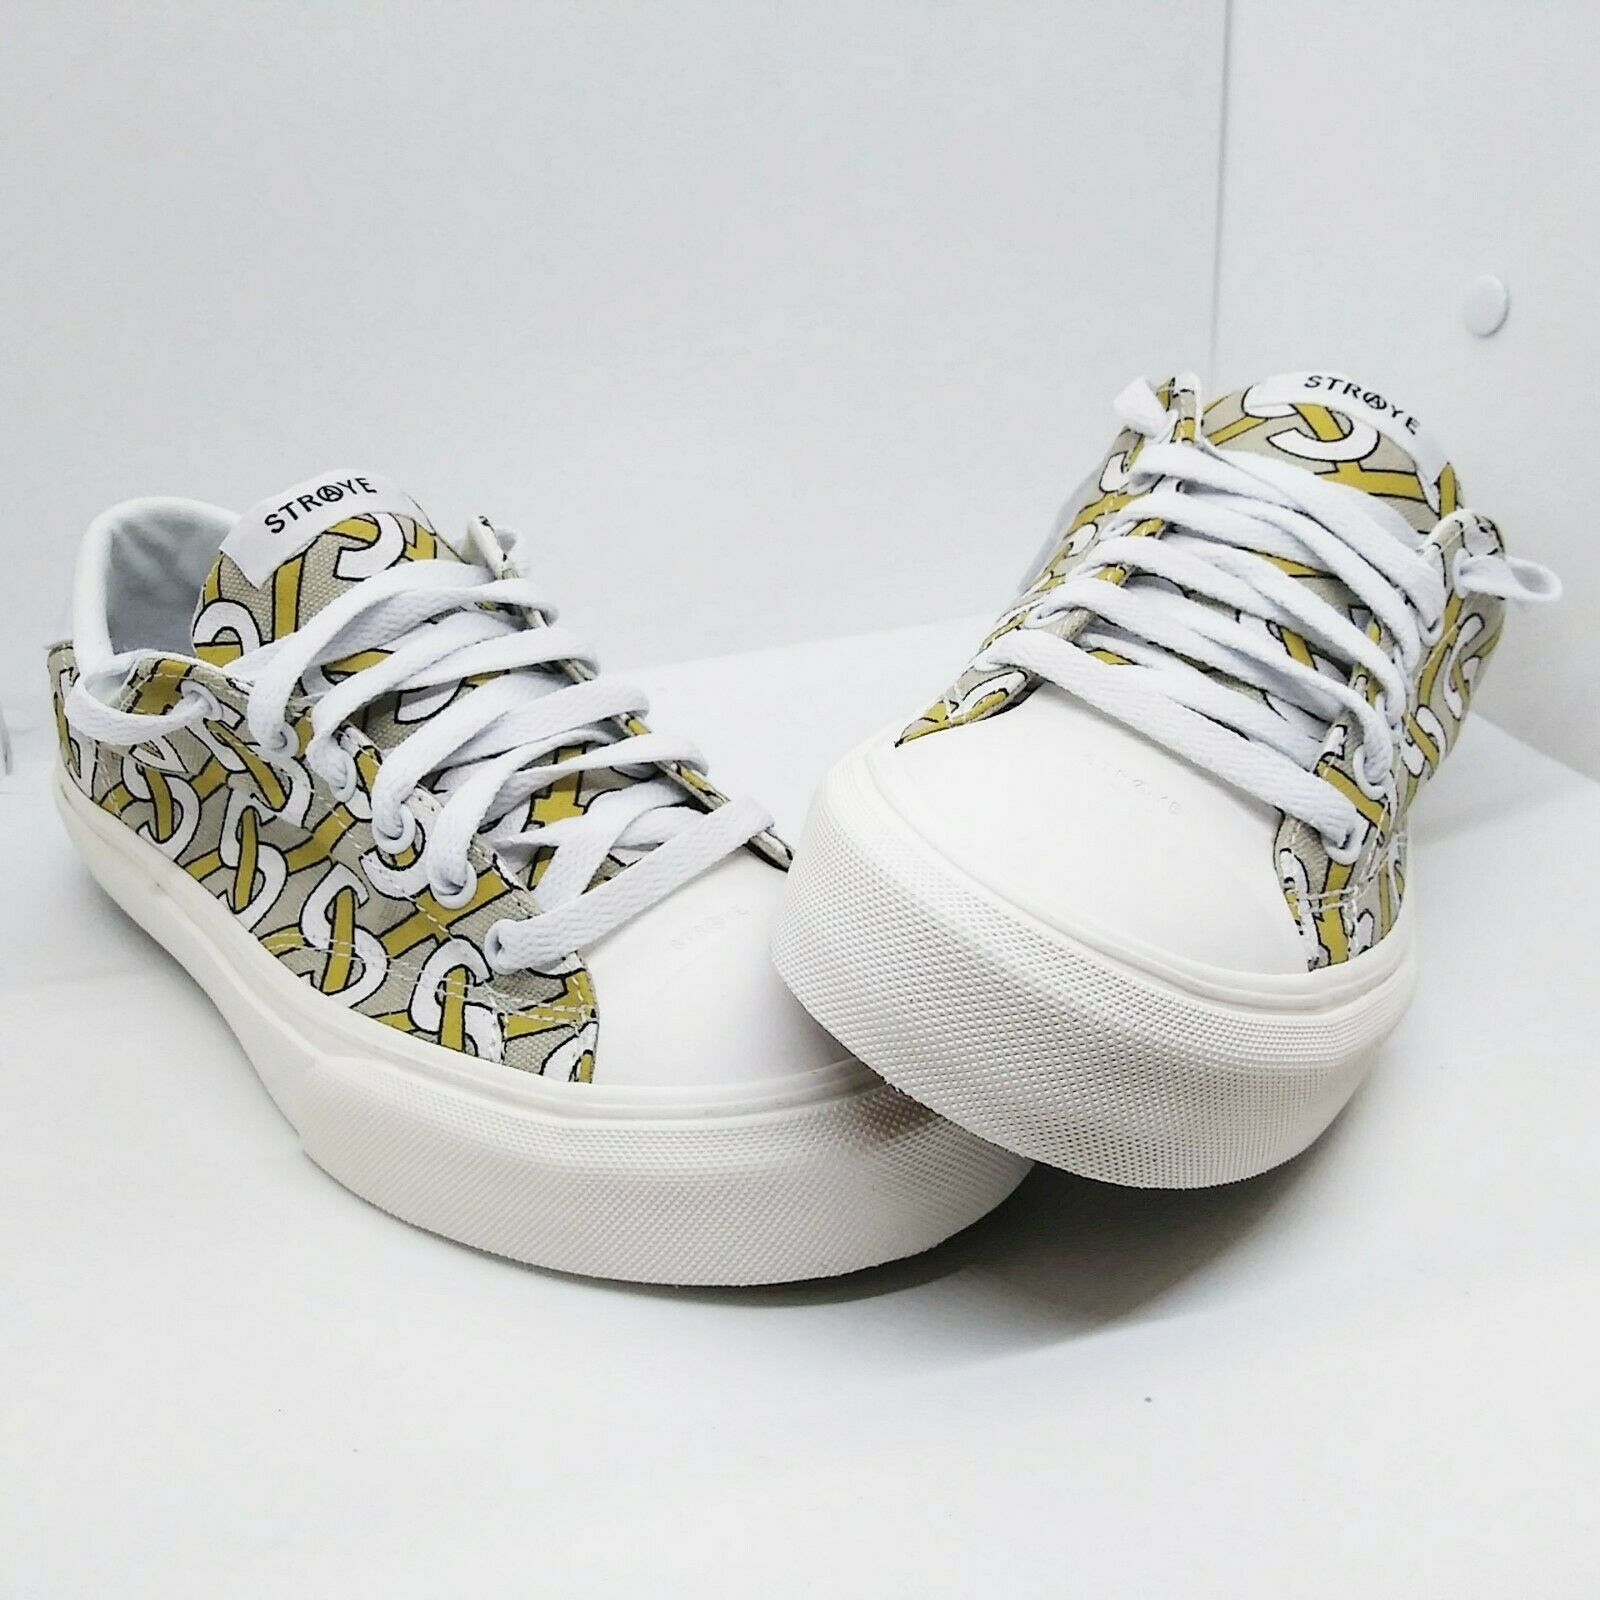 STRAYE 100%authentic Men's low Shoes size 9 STANLEY LINKS BONE